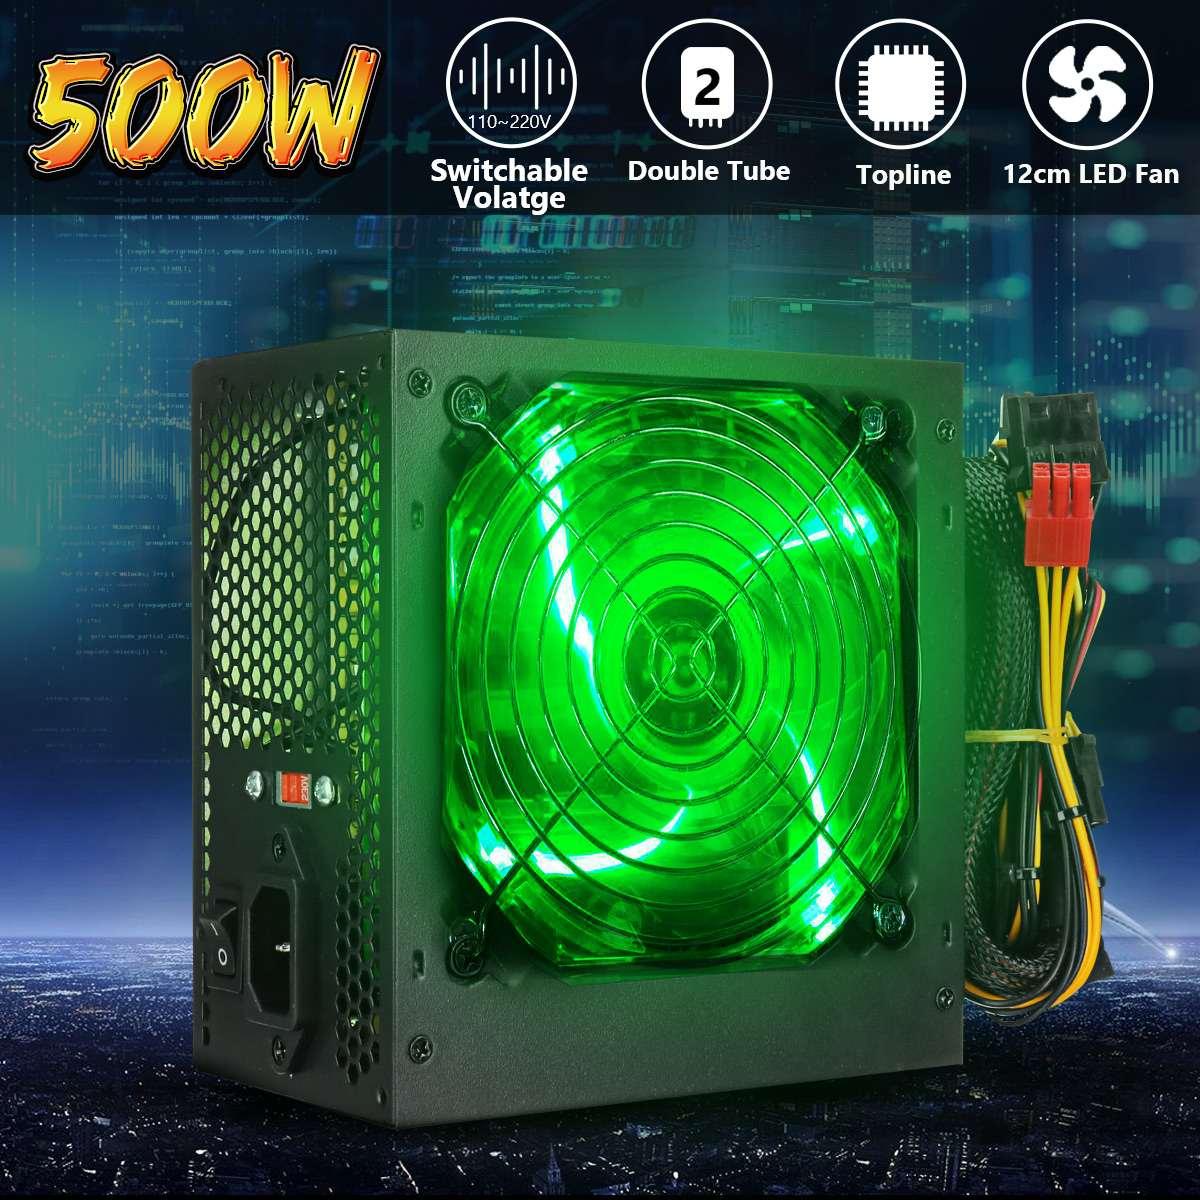 Max 500W Power Supply 120mm LED Fan 24 Pin PCI SATA ATX 12V PC Computer Power Supply For Desktop Gaming Computer